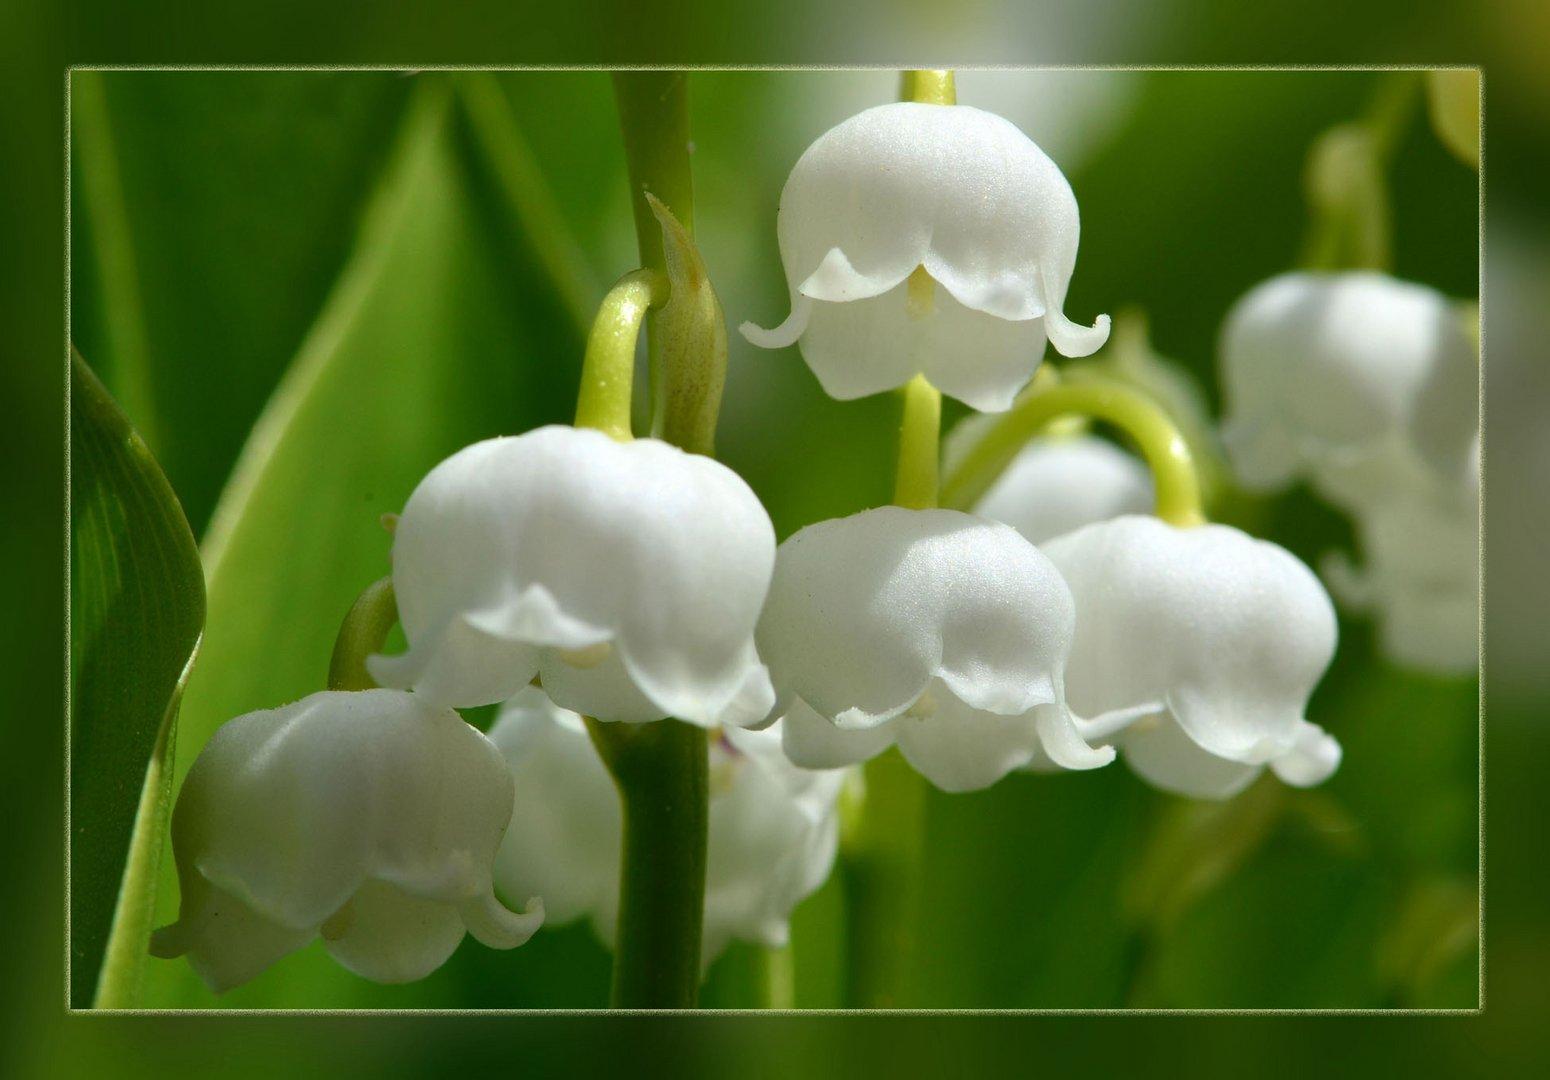 maigl ckchen zum muttertag foto bild pflanzen pilze flechten bl ten kleinpflanzen. Black Bedroom Furniture Sets. Home Design Ideas